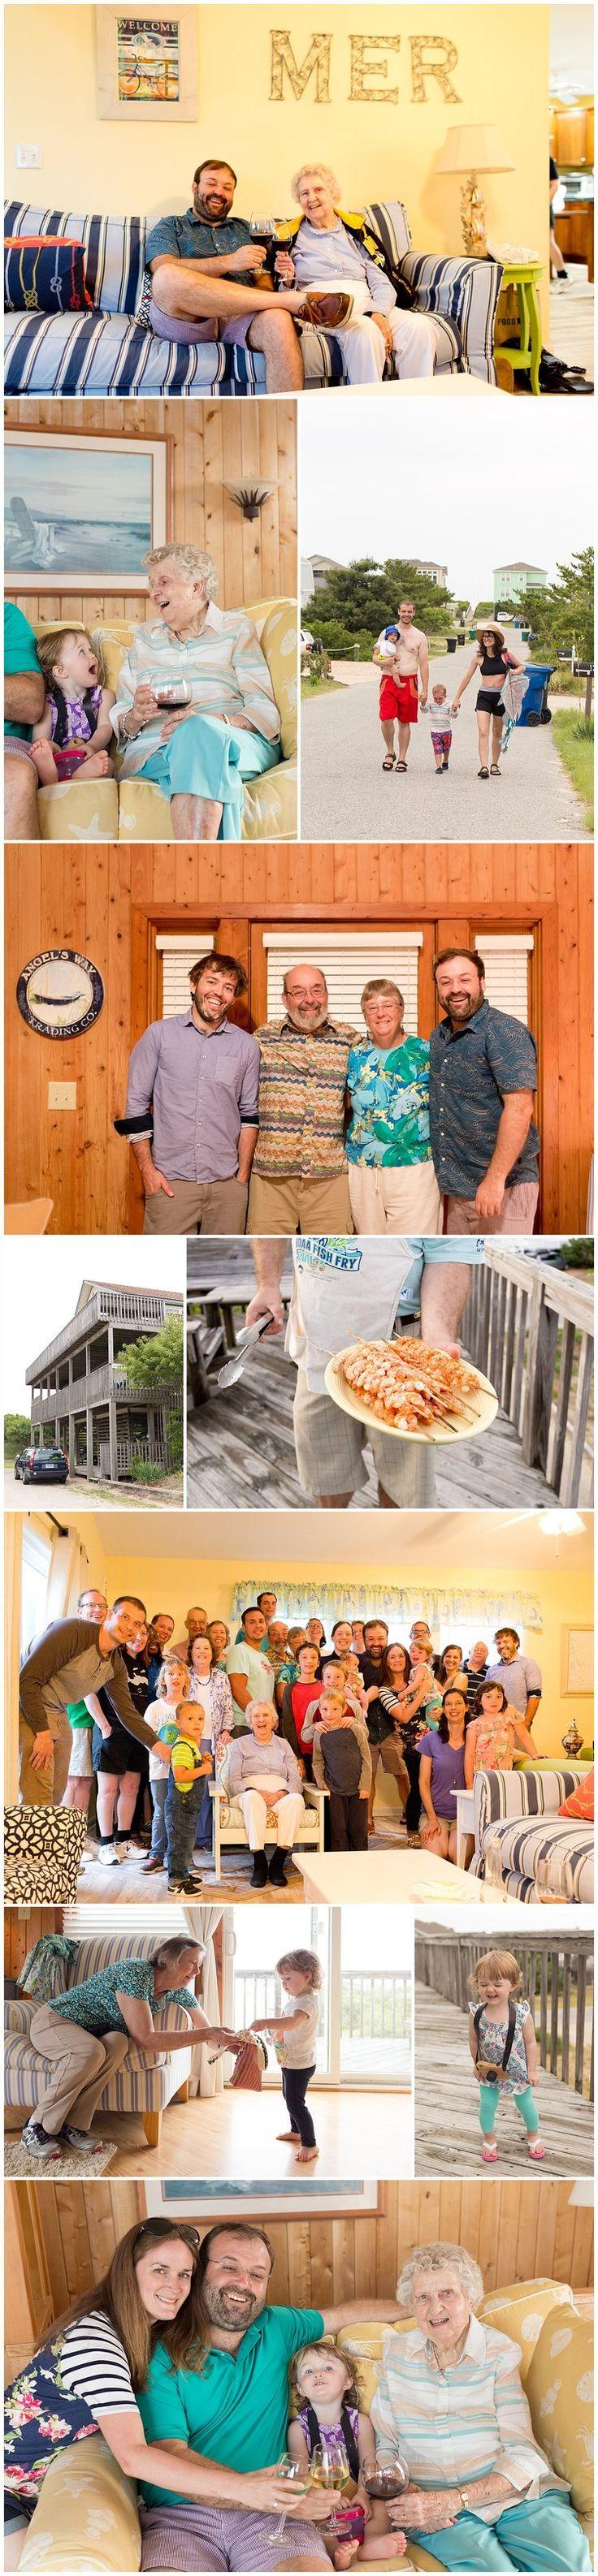 Outer Banks family vacation photos - Duck, North Carolina